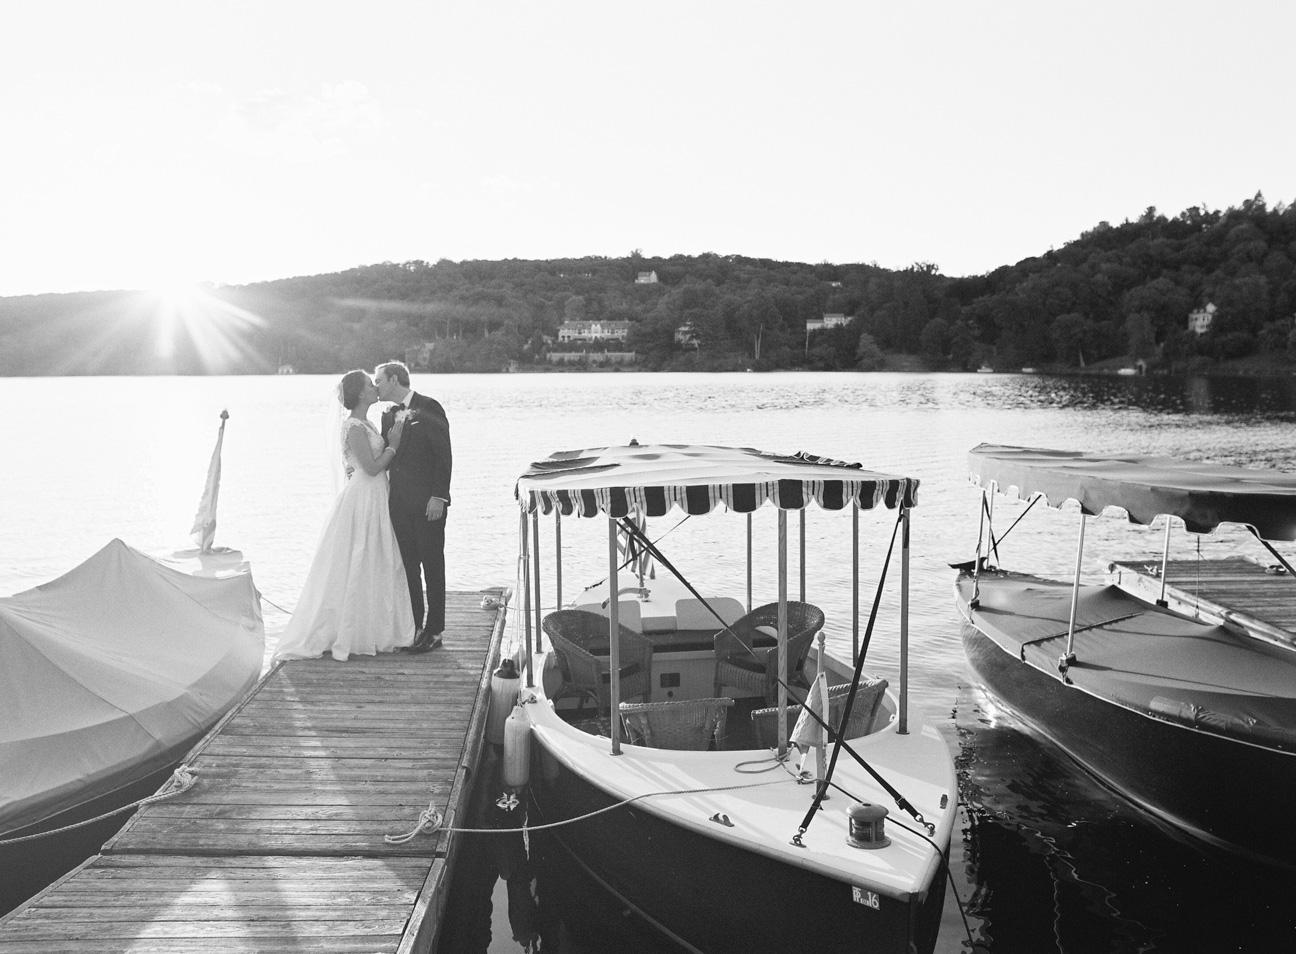 Wedding couple by a lake kissing